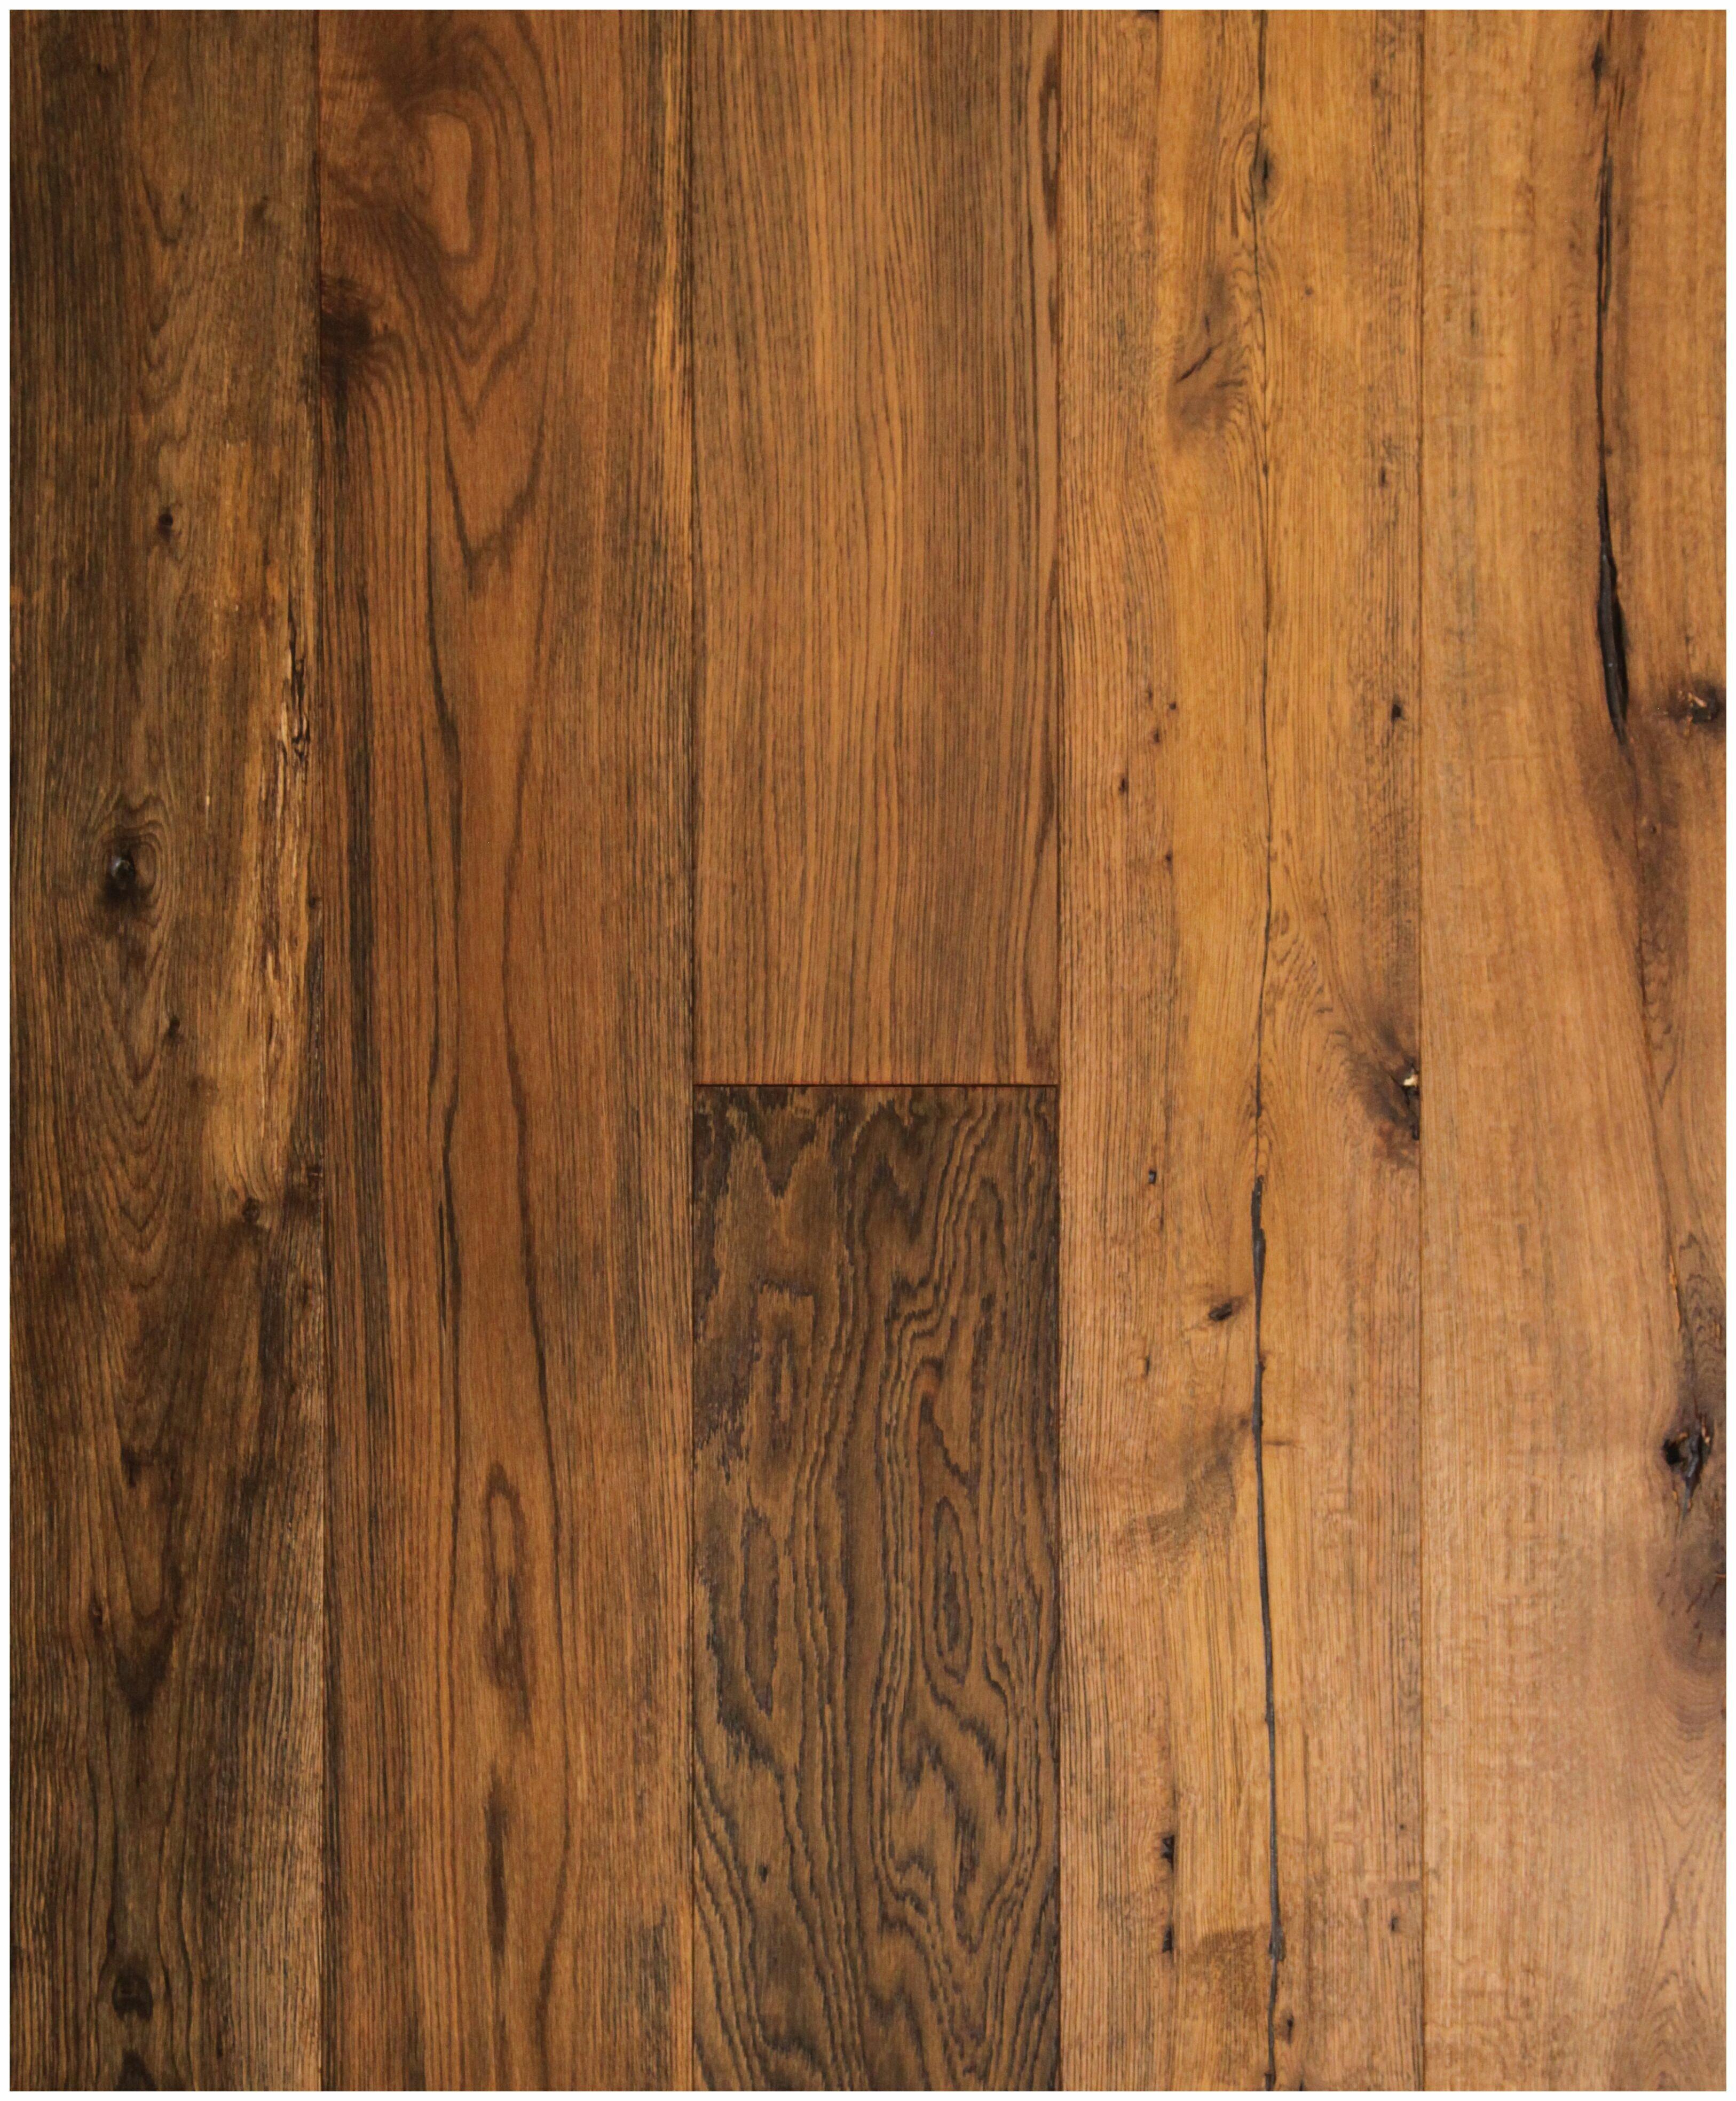 Easoon Usa Chicago 7 12 Engineered Oak Hardwood Flooring Wayfair